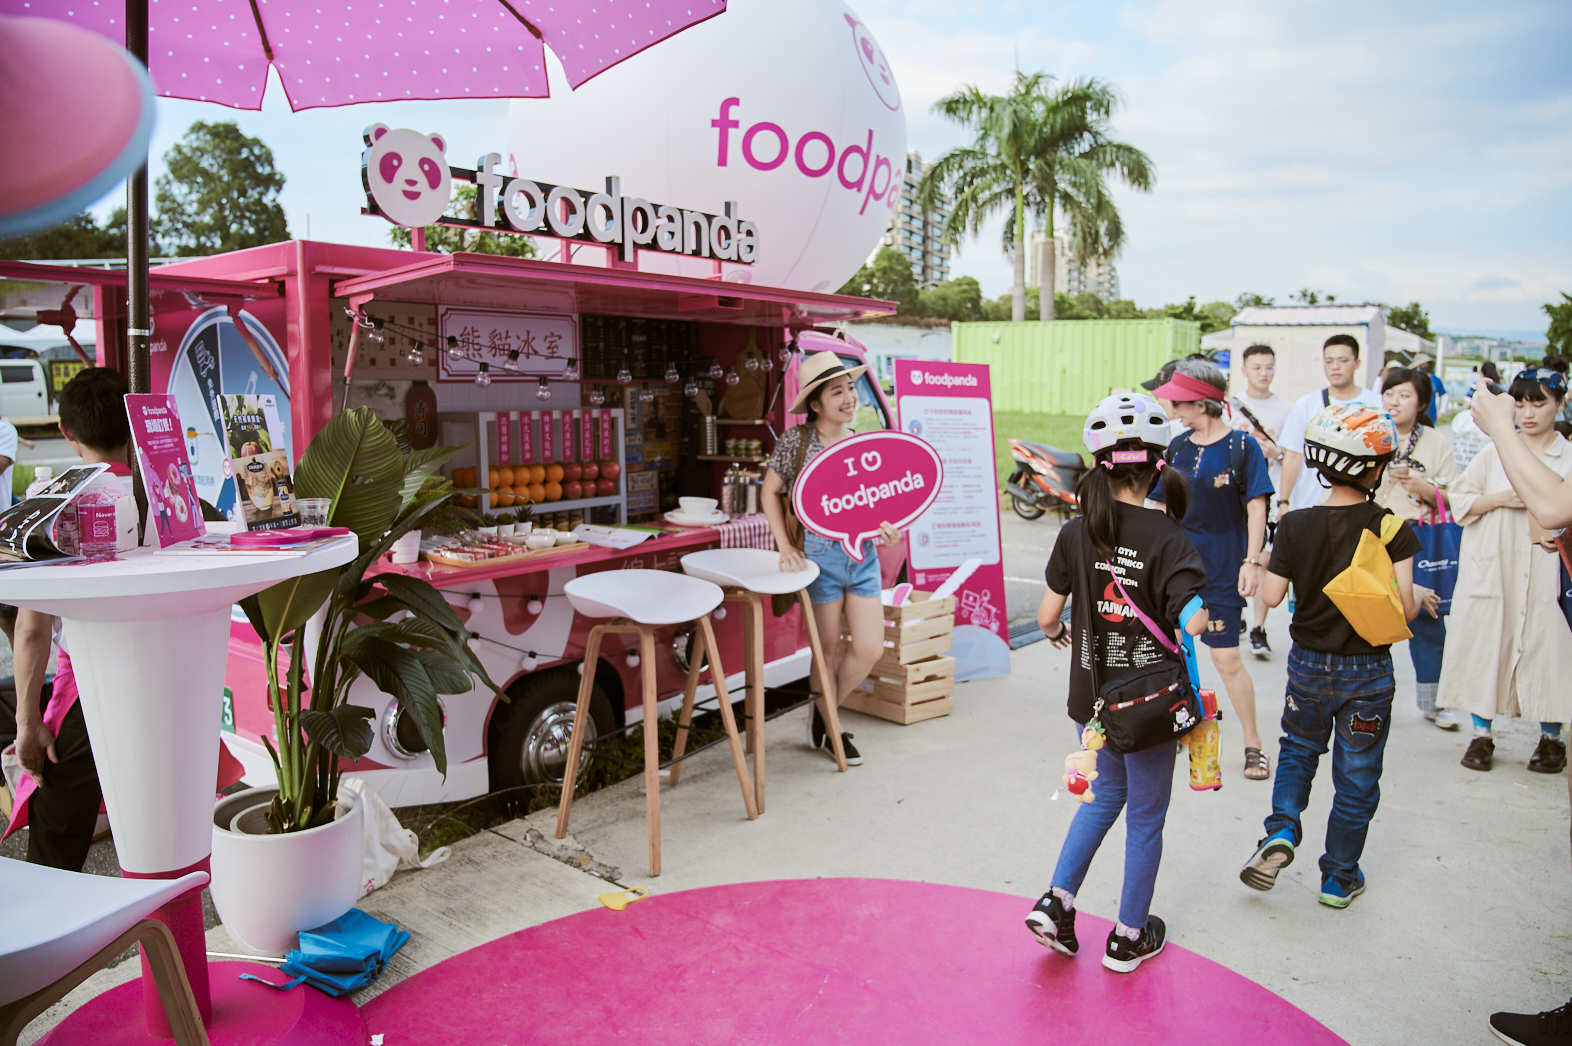 Food Panda 2 - giles.heasman(何家樂) - Taiwan - Vogue Picnic - Sponsor 1